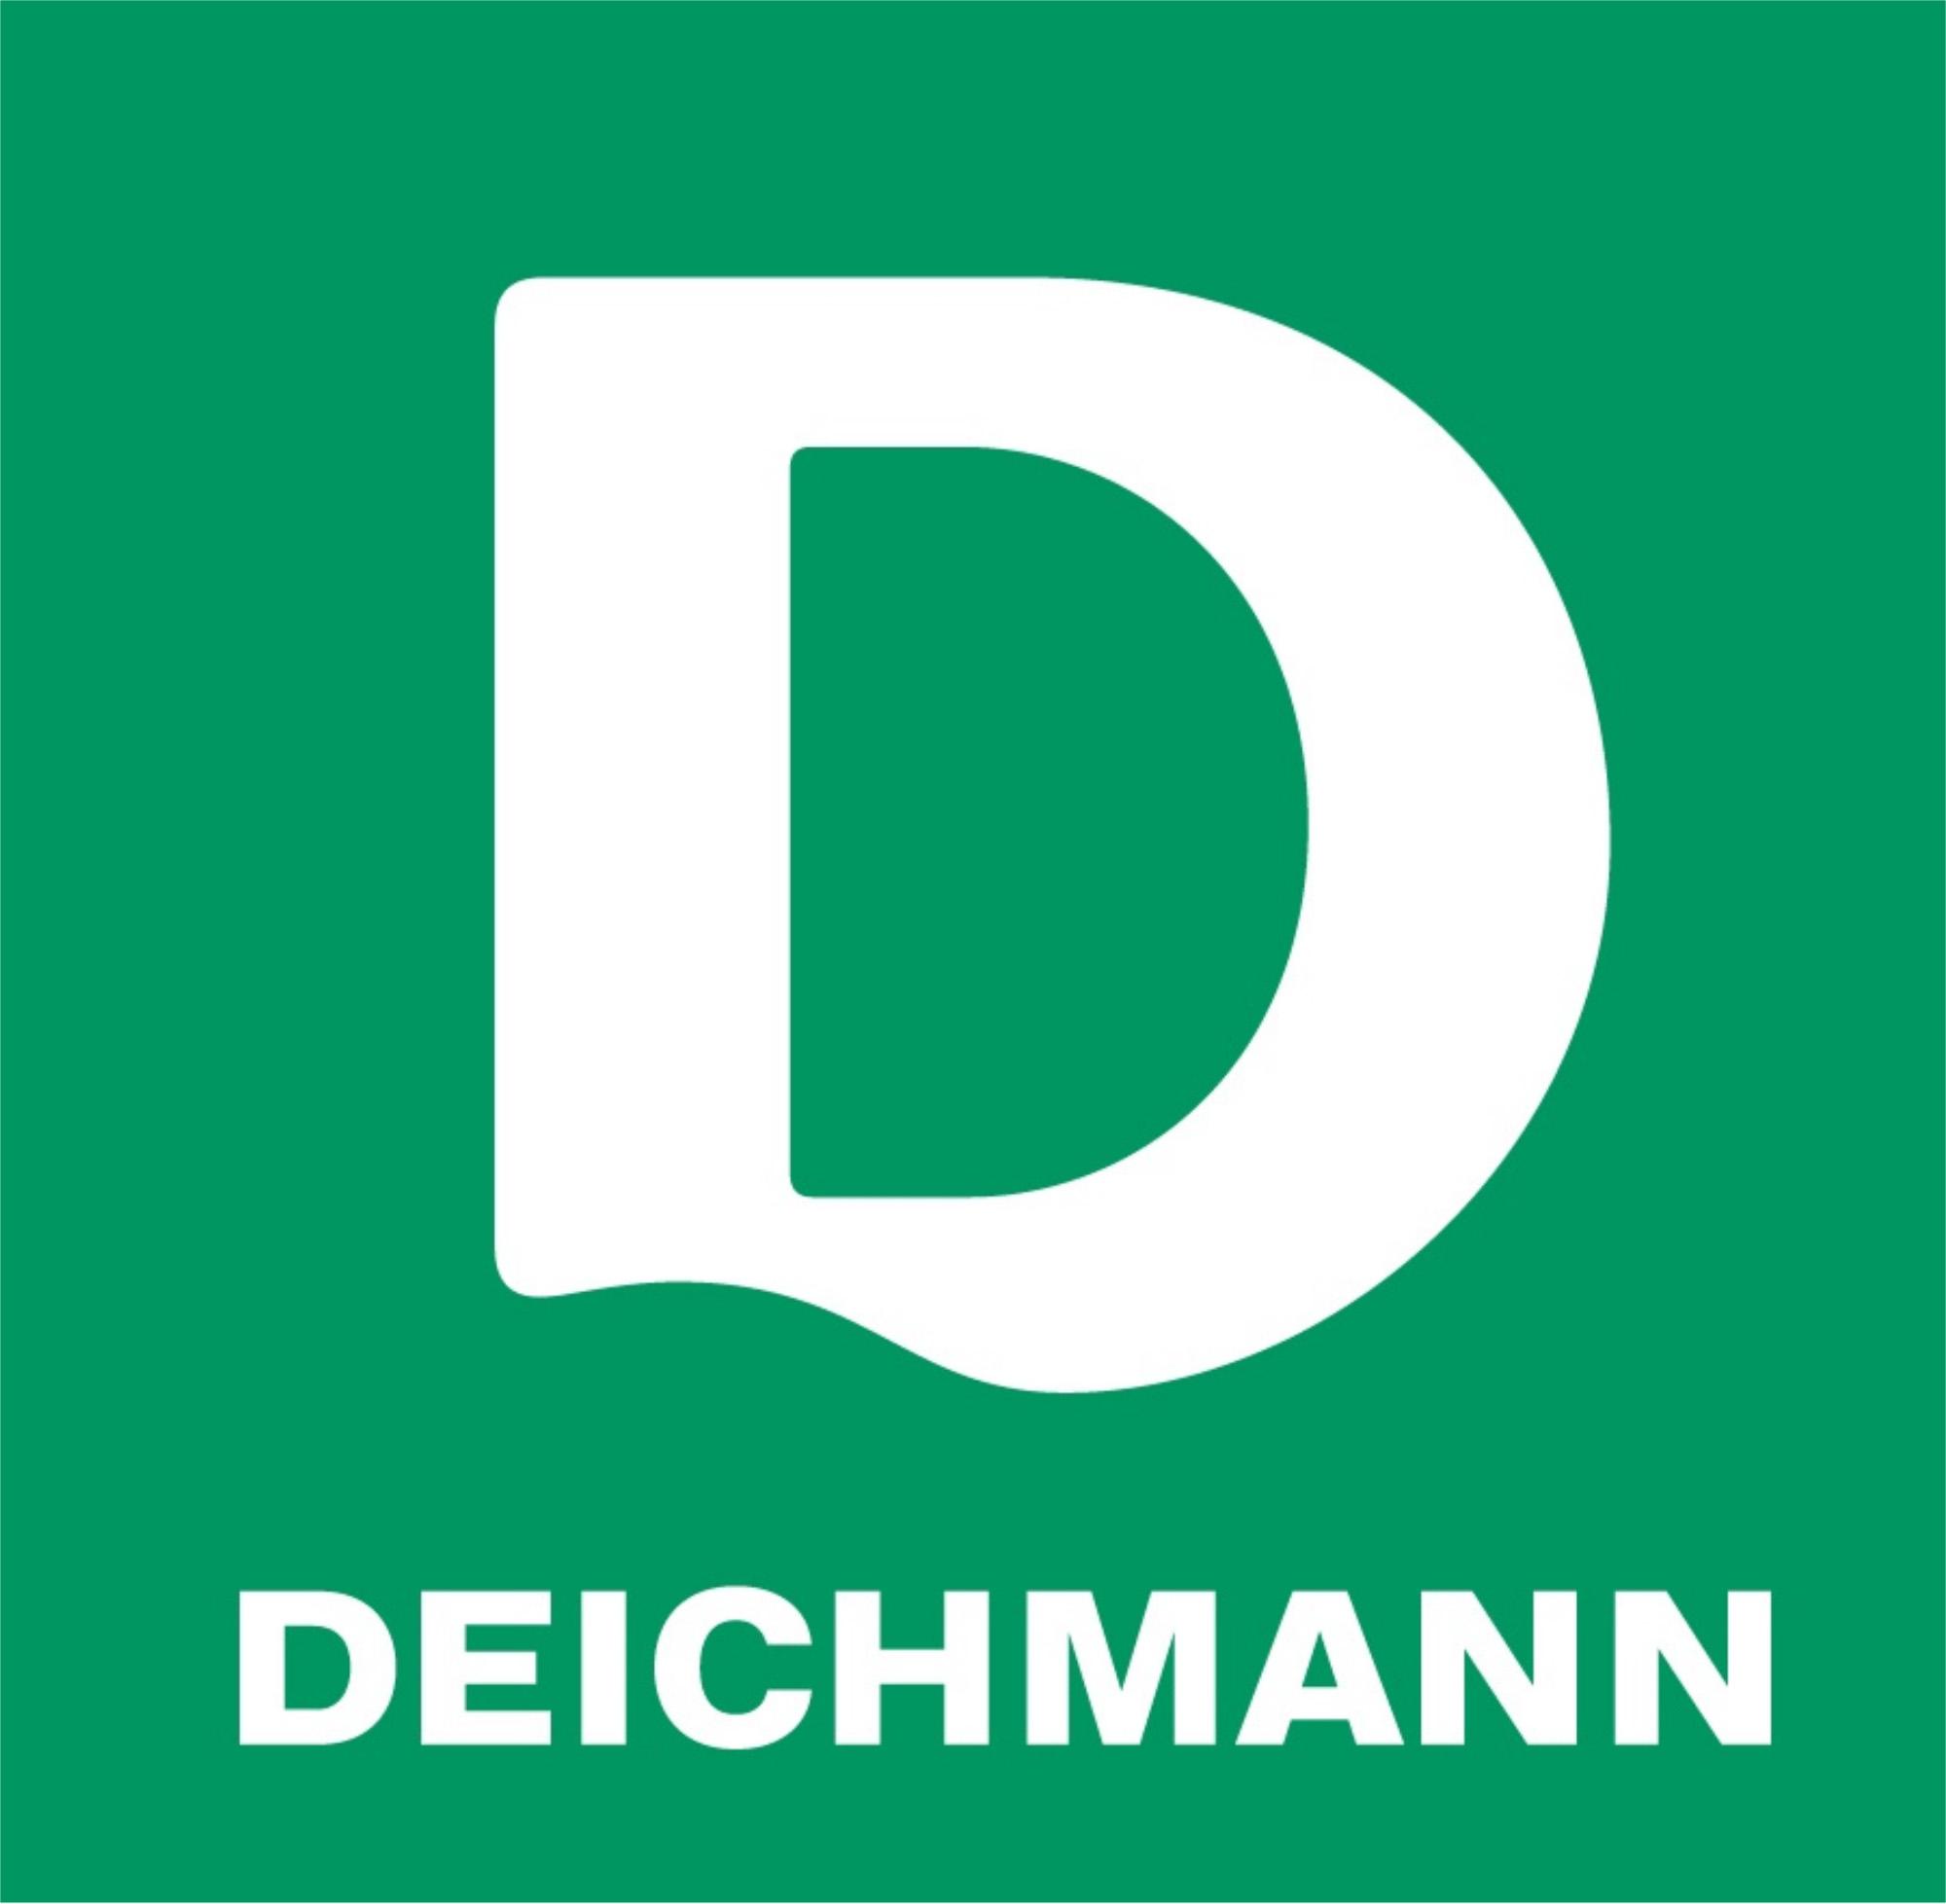 Deichmann_logo.jpg